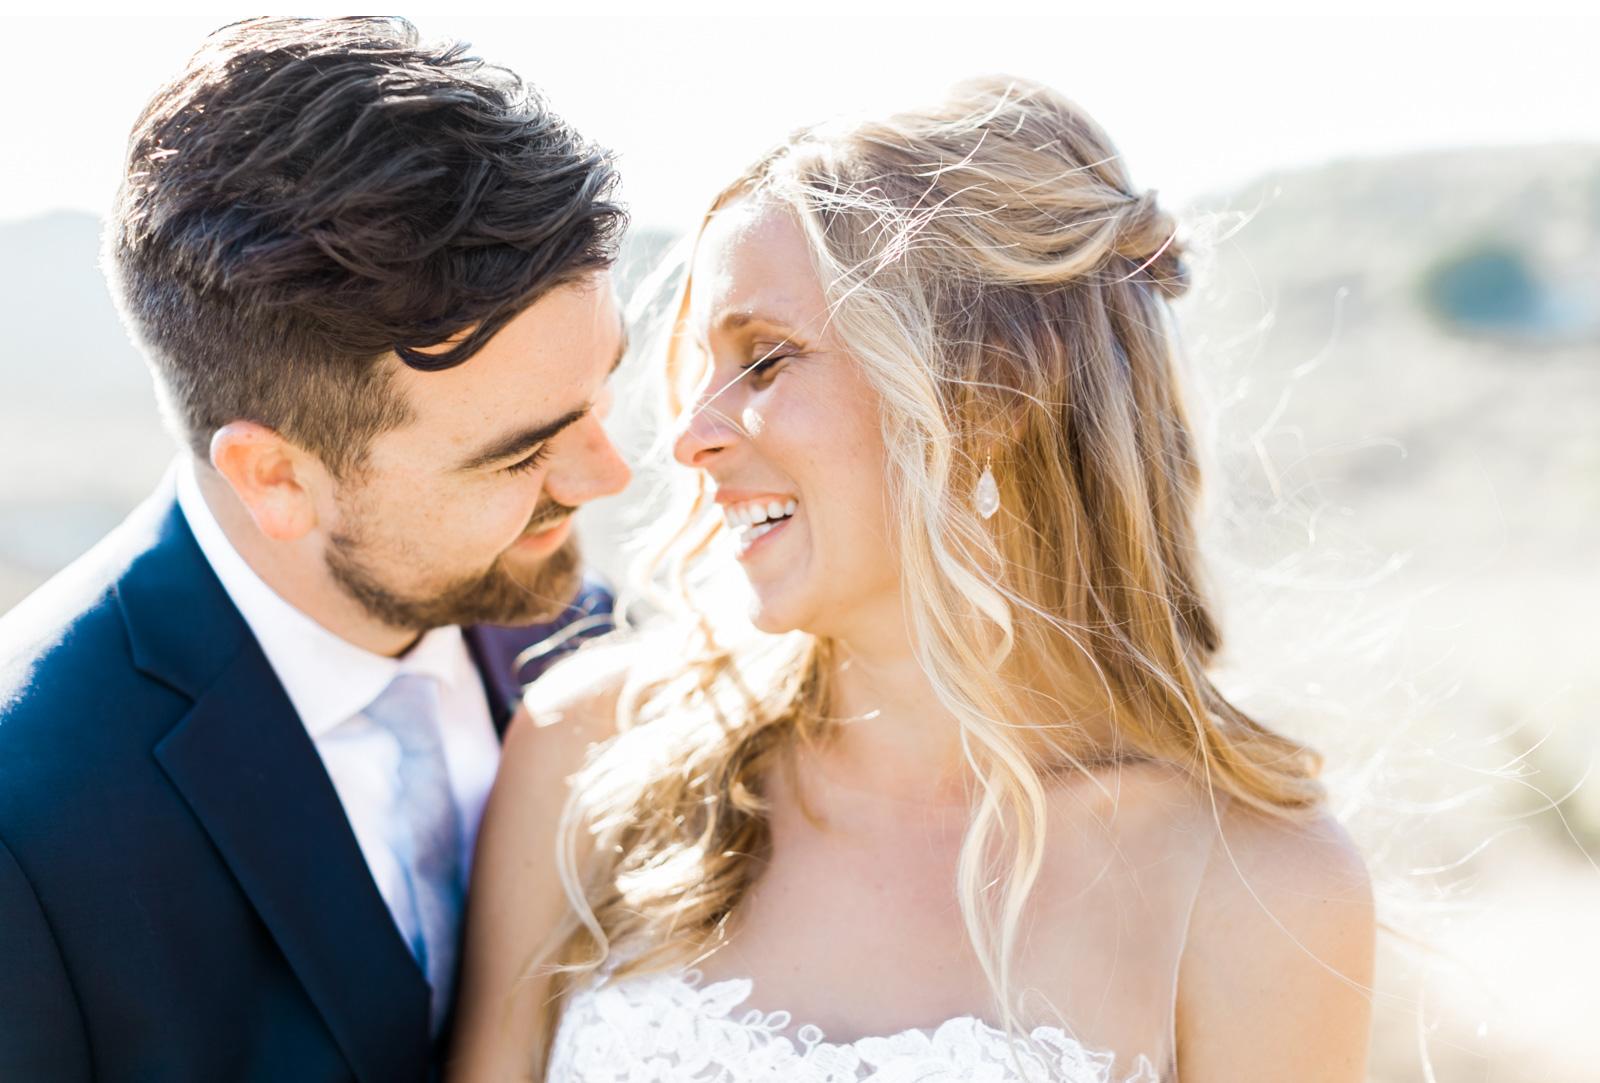 Style-Me-Pretty-San-Luis-Obispo-Wedding-Natalie-Schutt-Photography_04.jpg